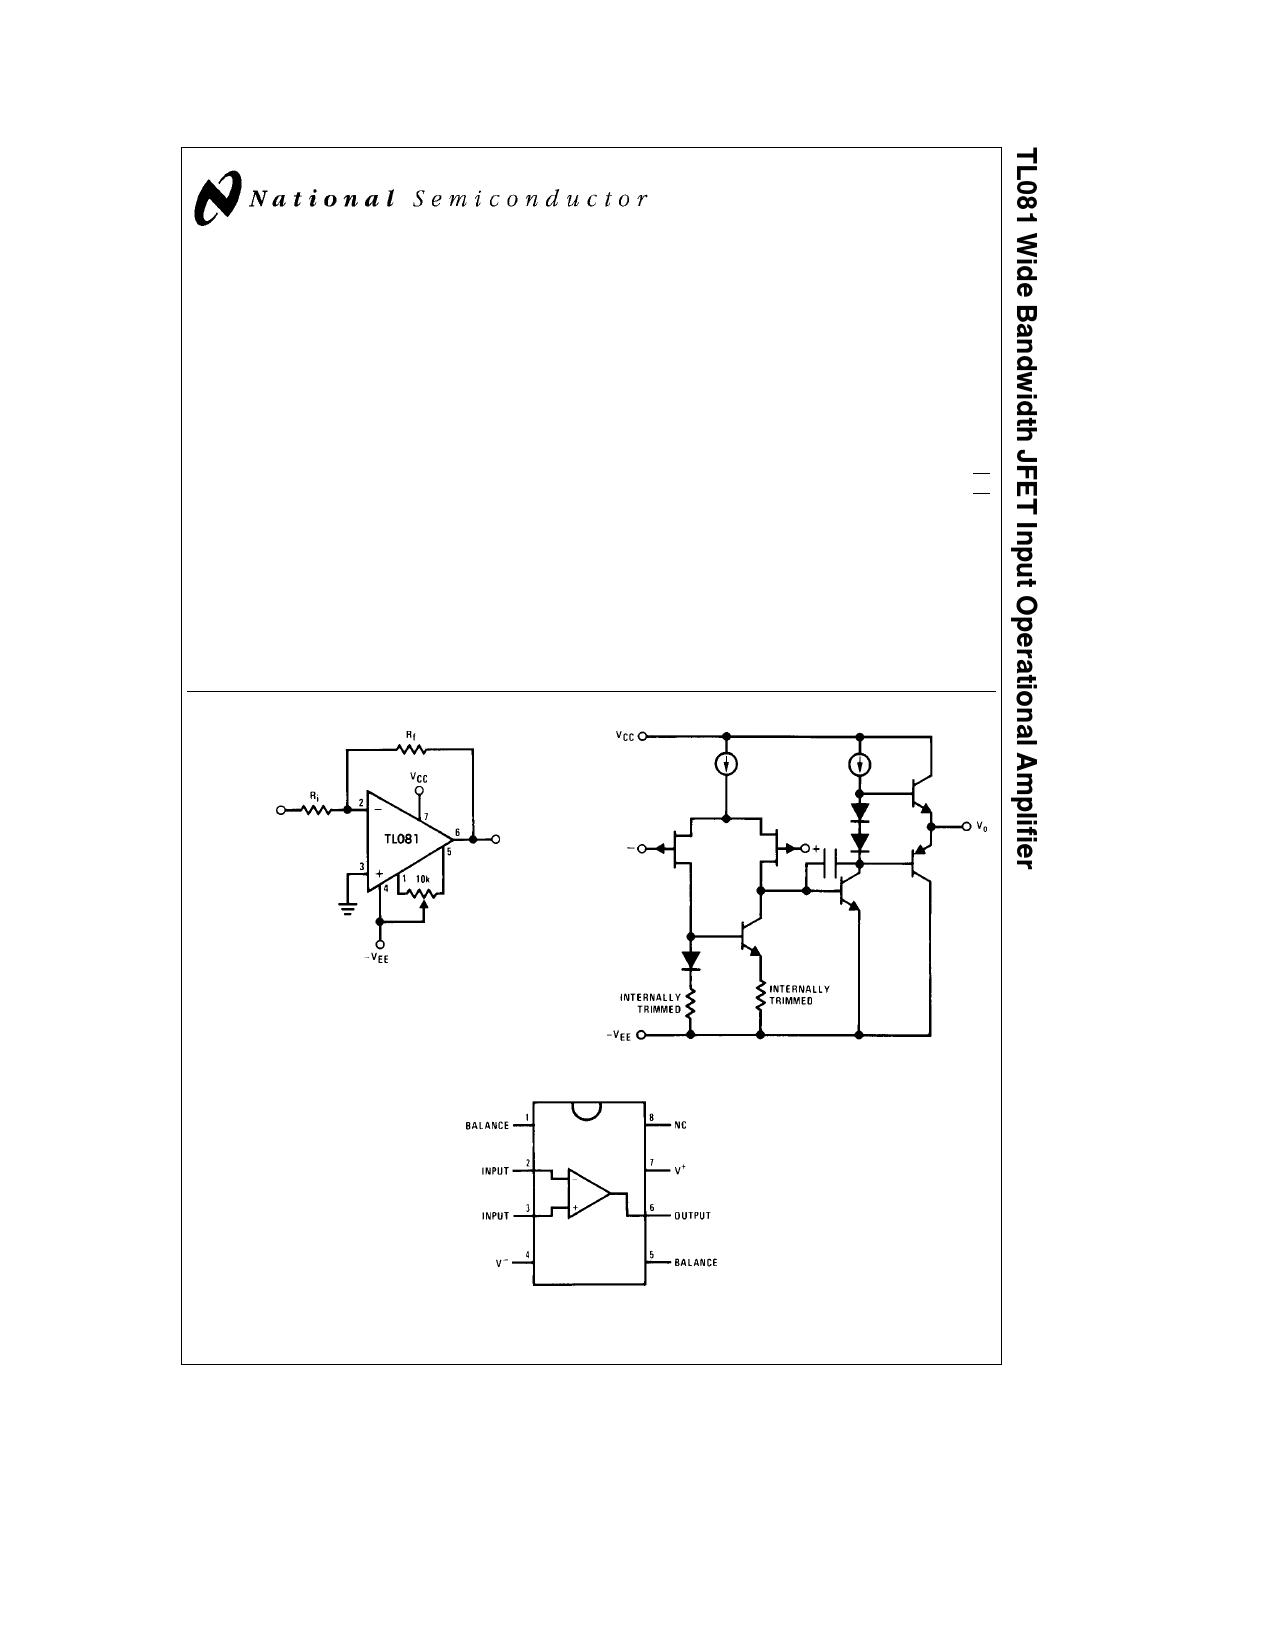 tl081 datasheet pdf   pinout